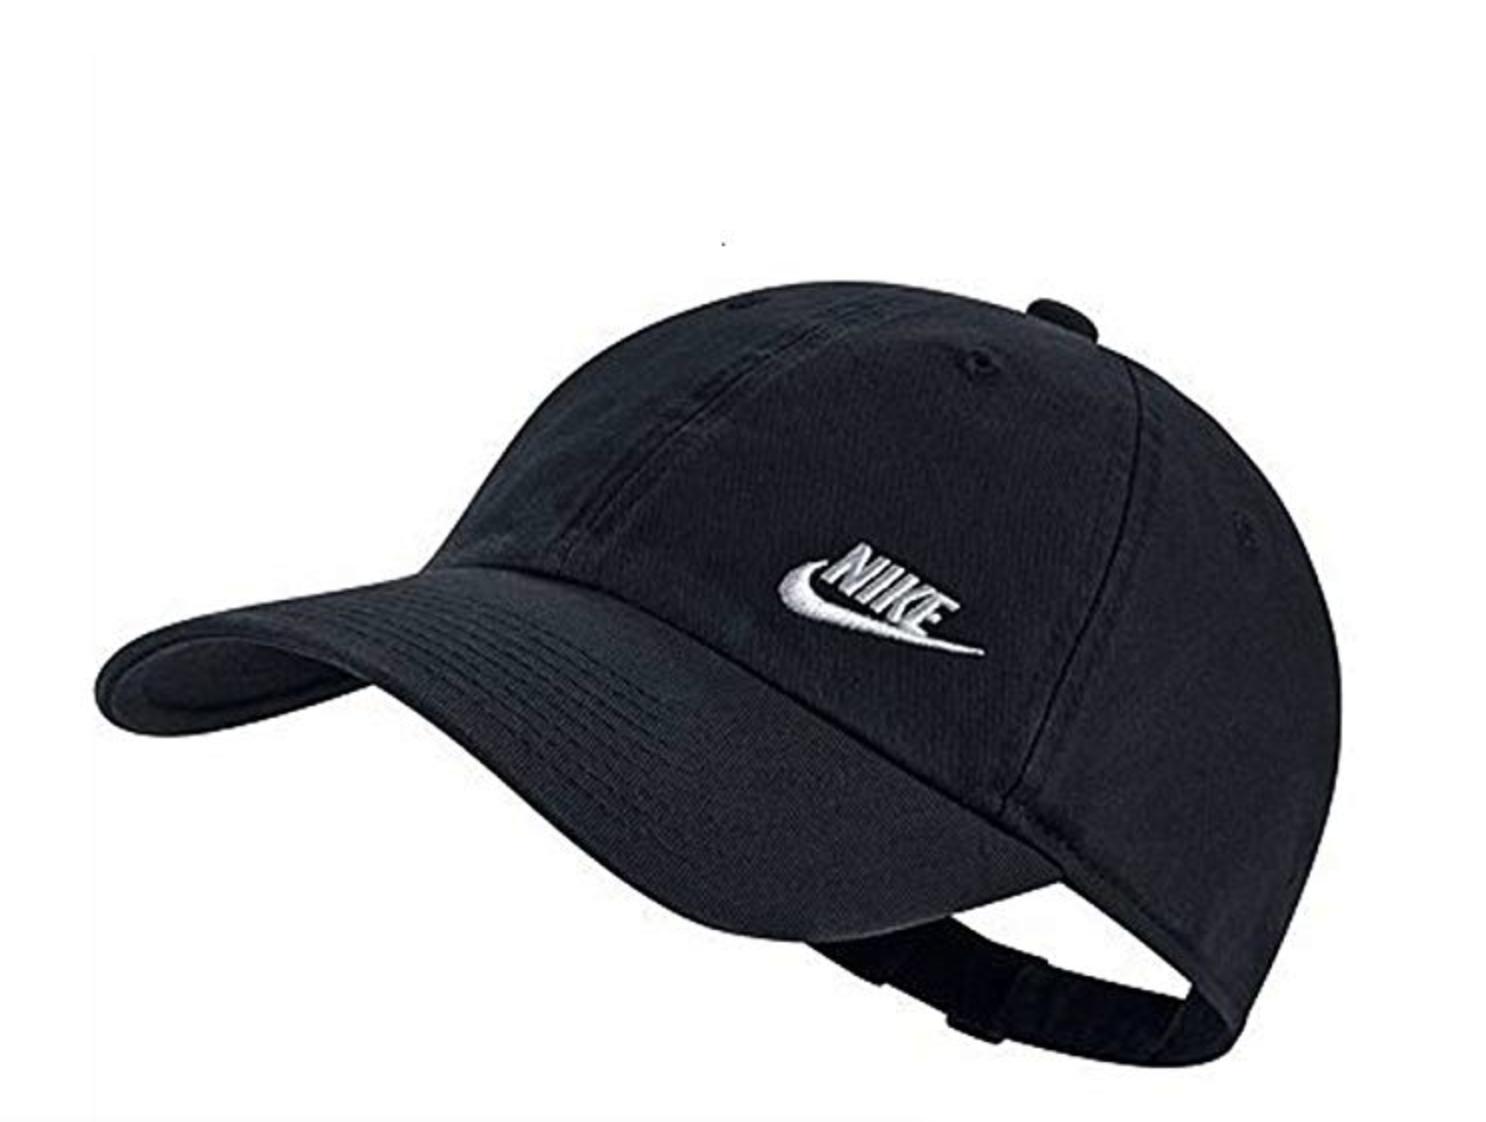 Nike Futura Classic Hat - $25